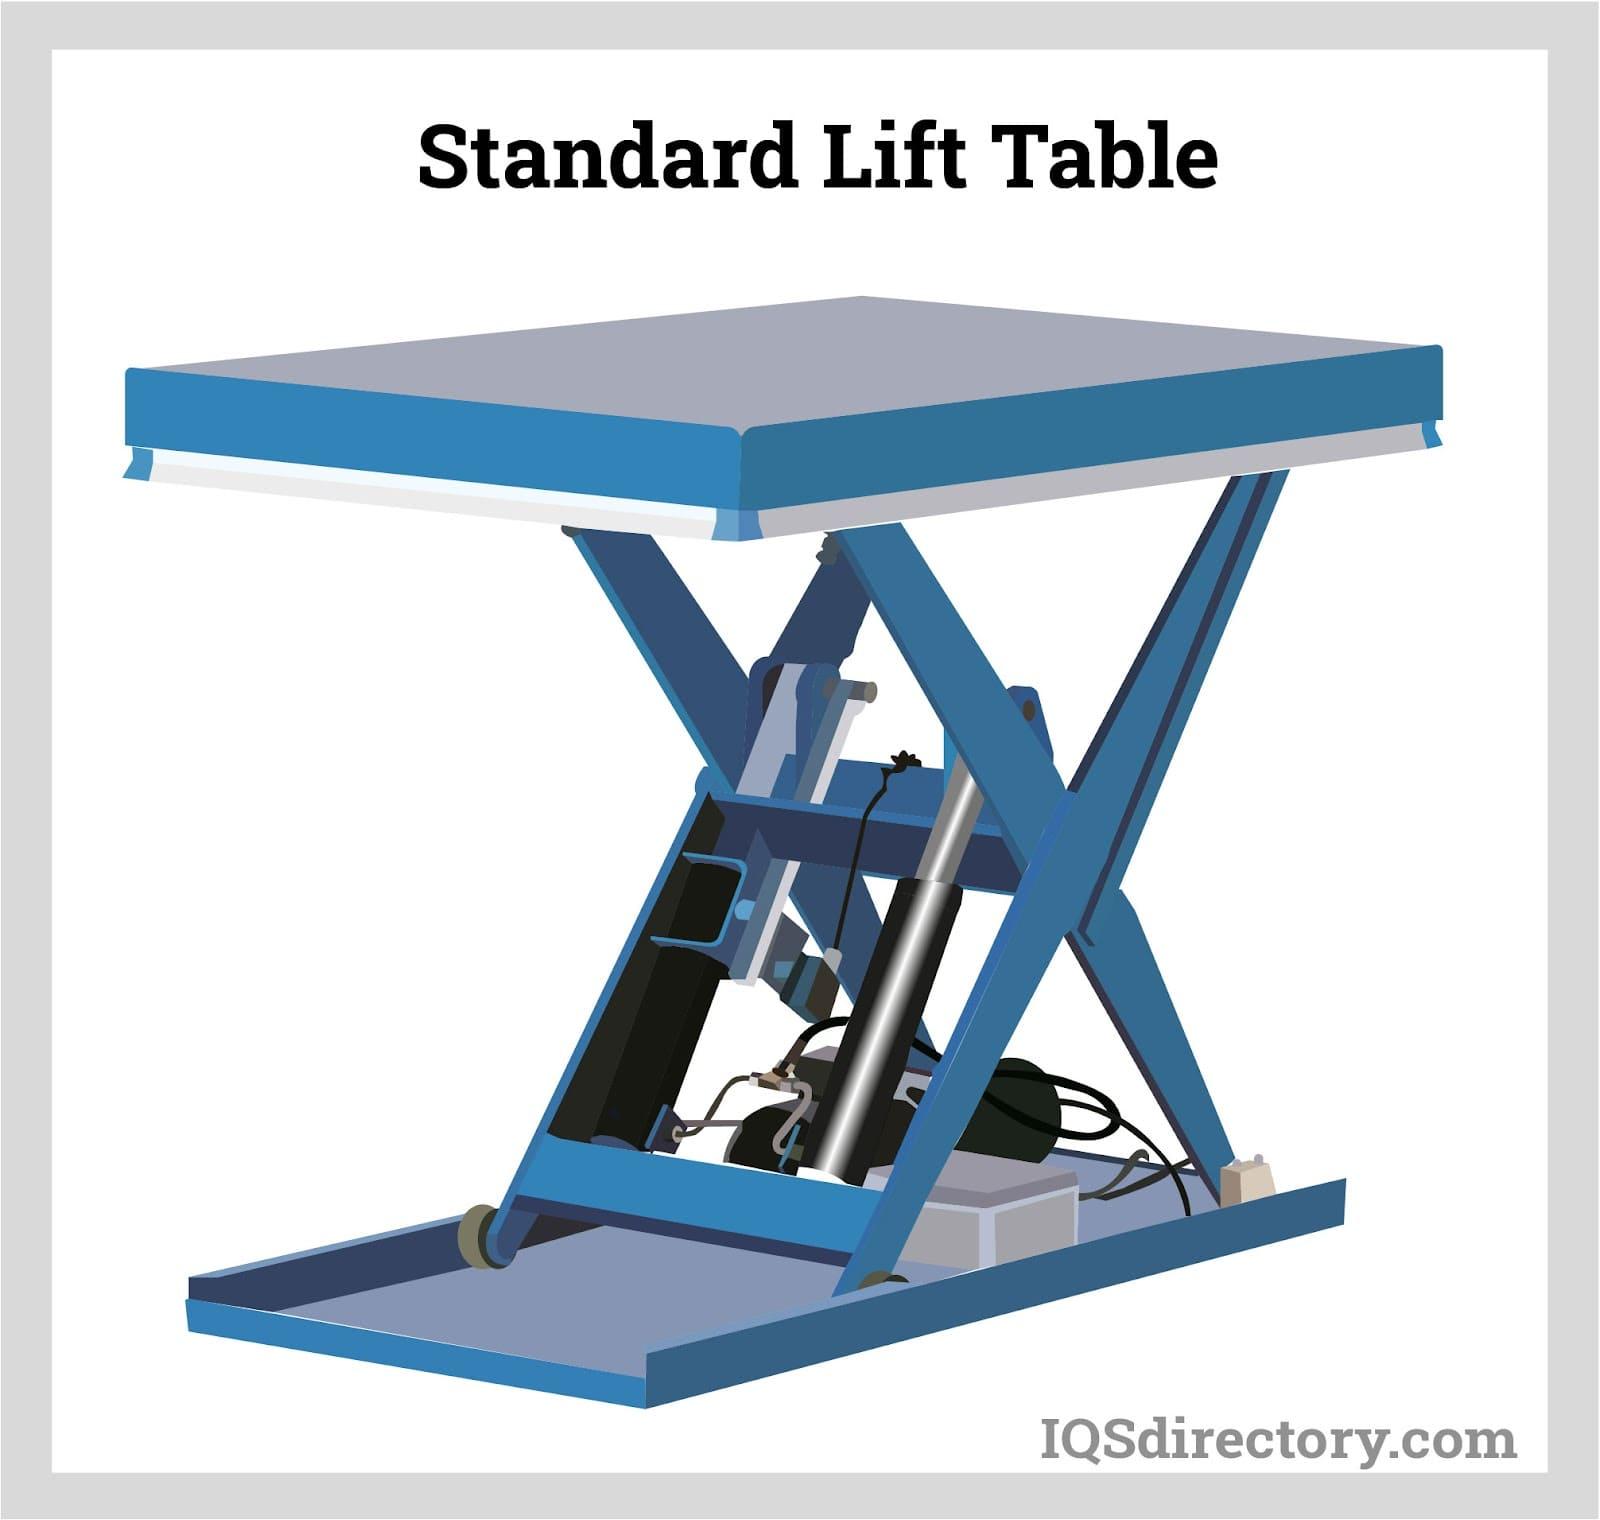 Standard Lift Table